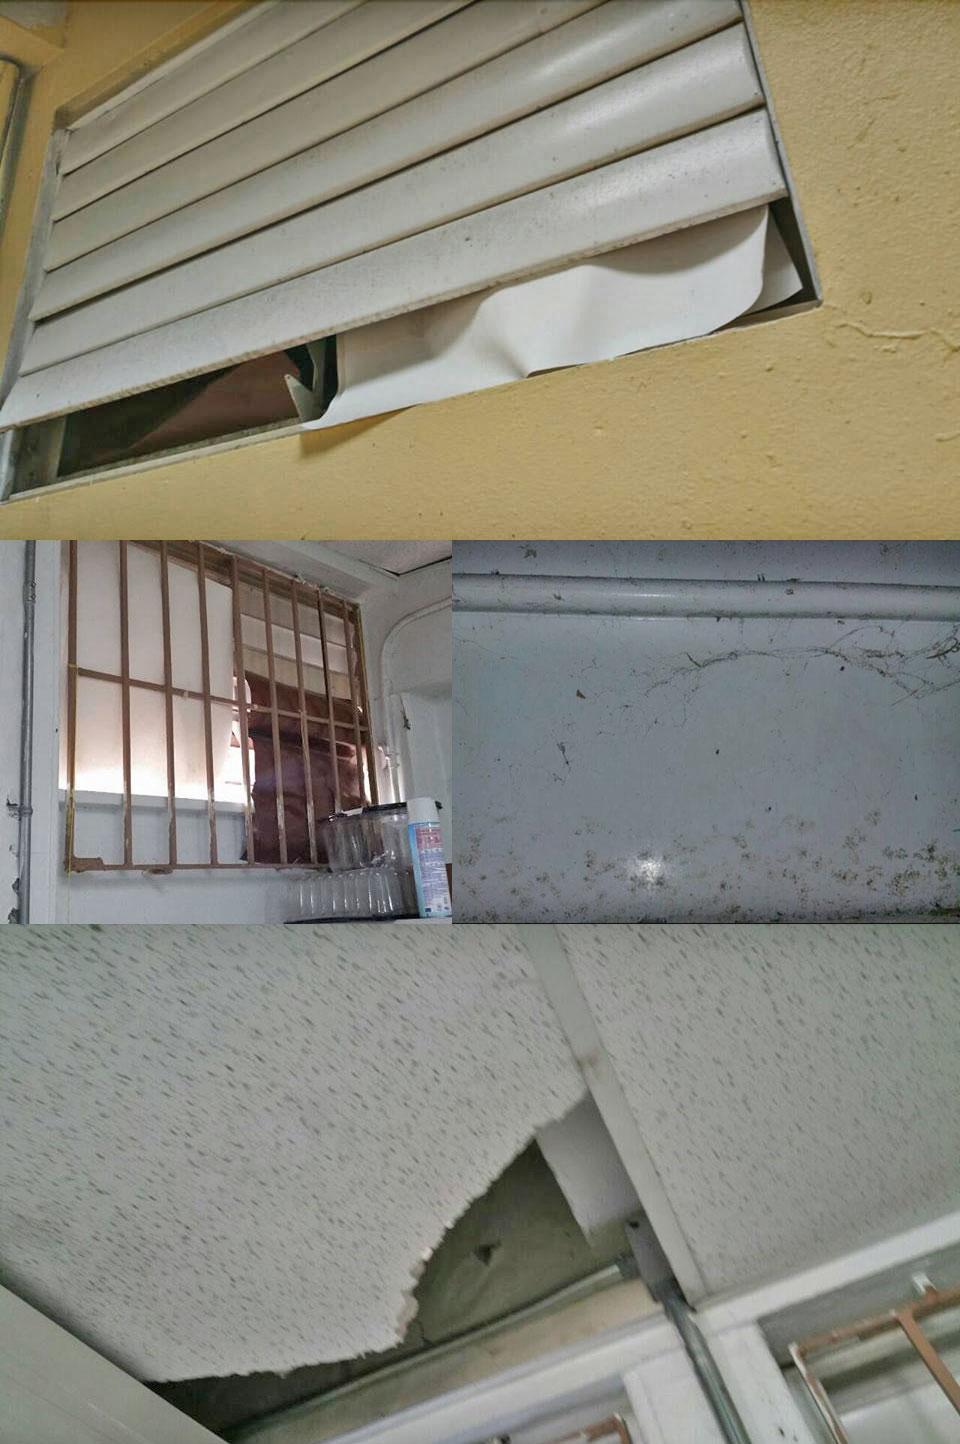 Escuela Petra Román Vigo del Barrio San Antón, Carolina, Puerto Rico, deteriorada.